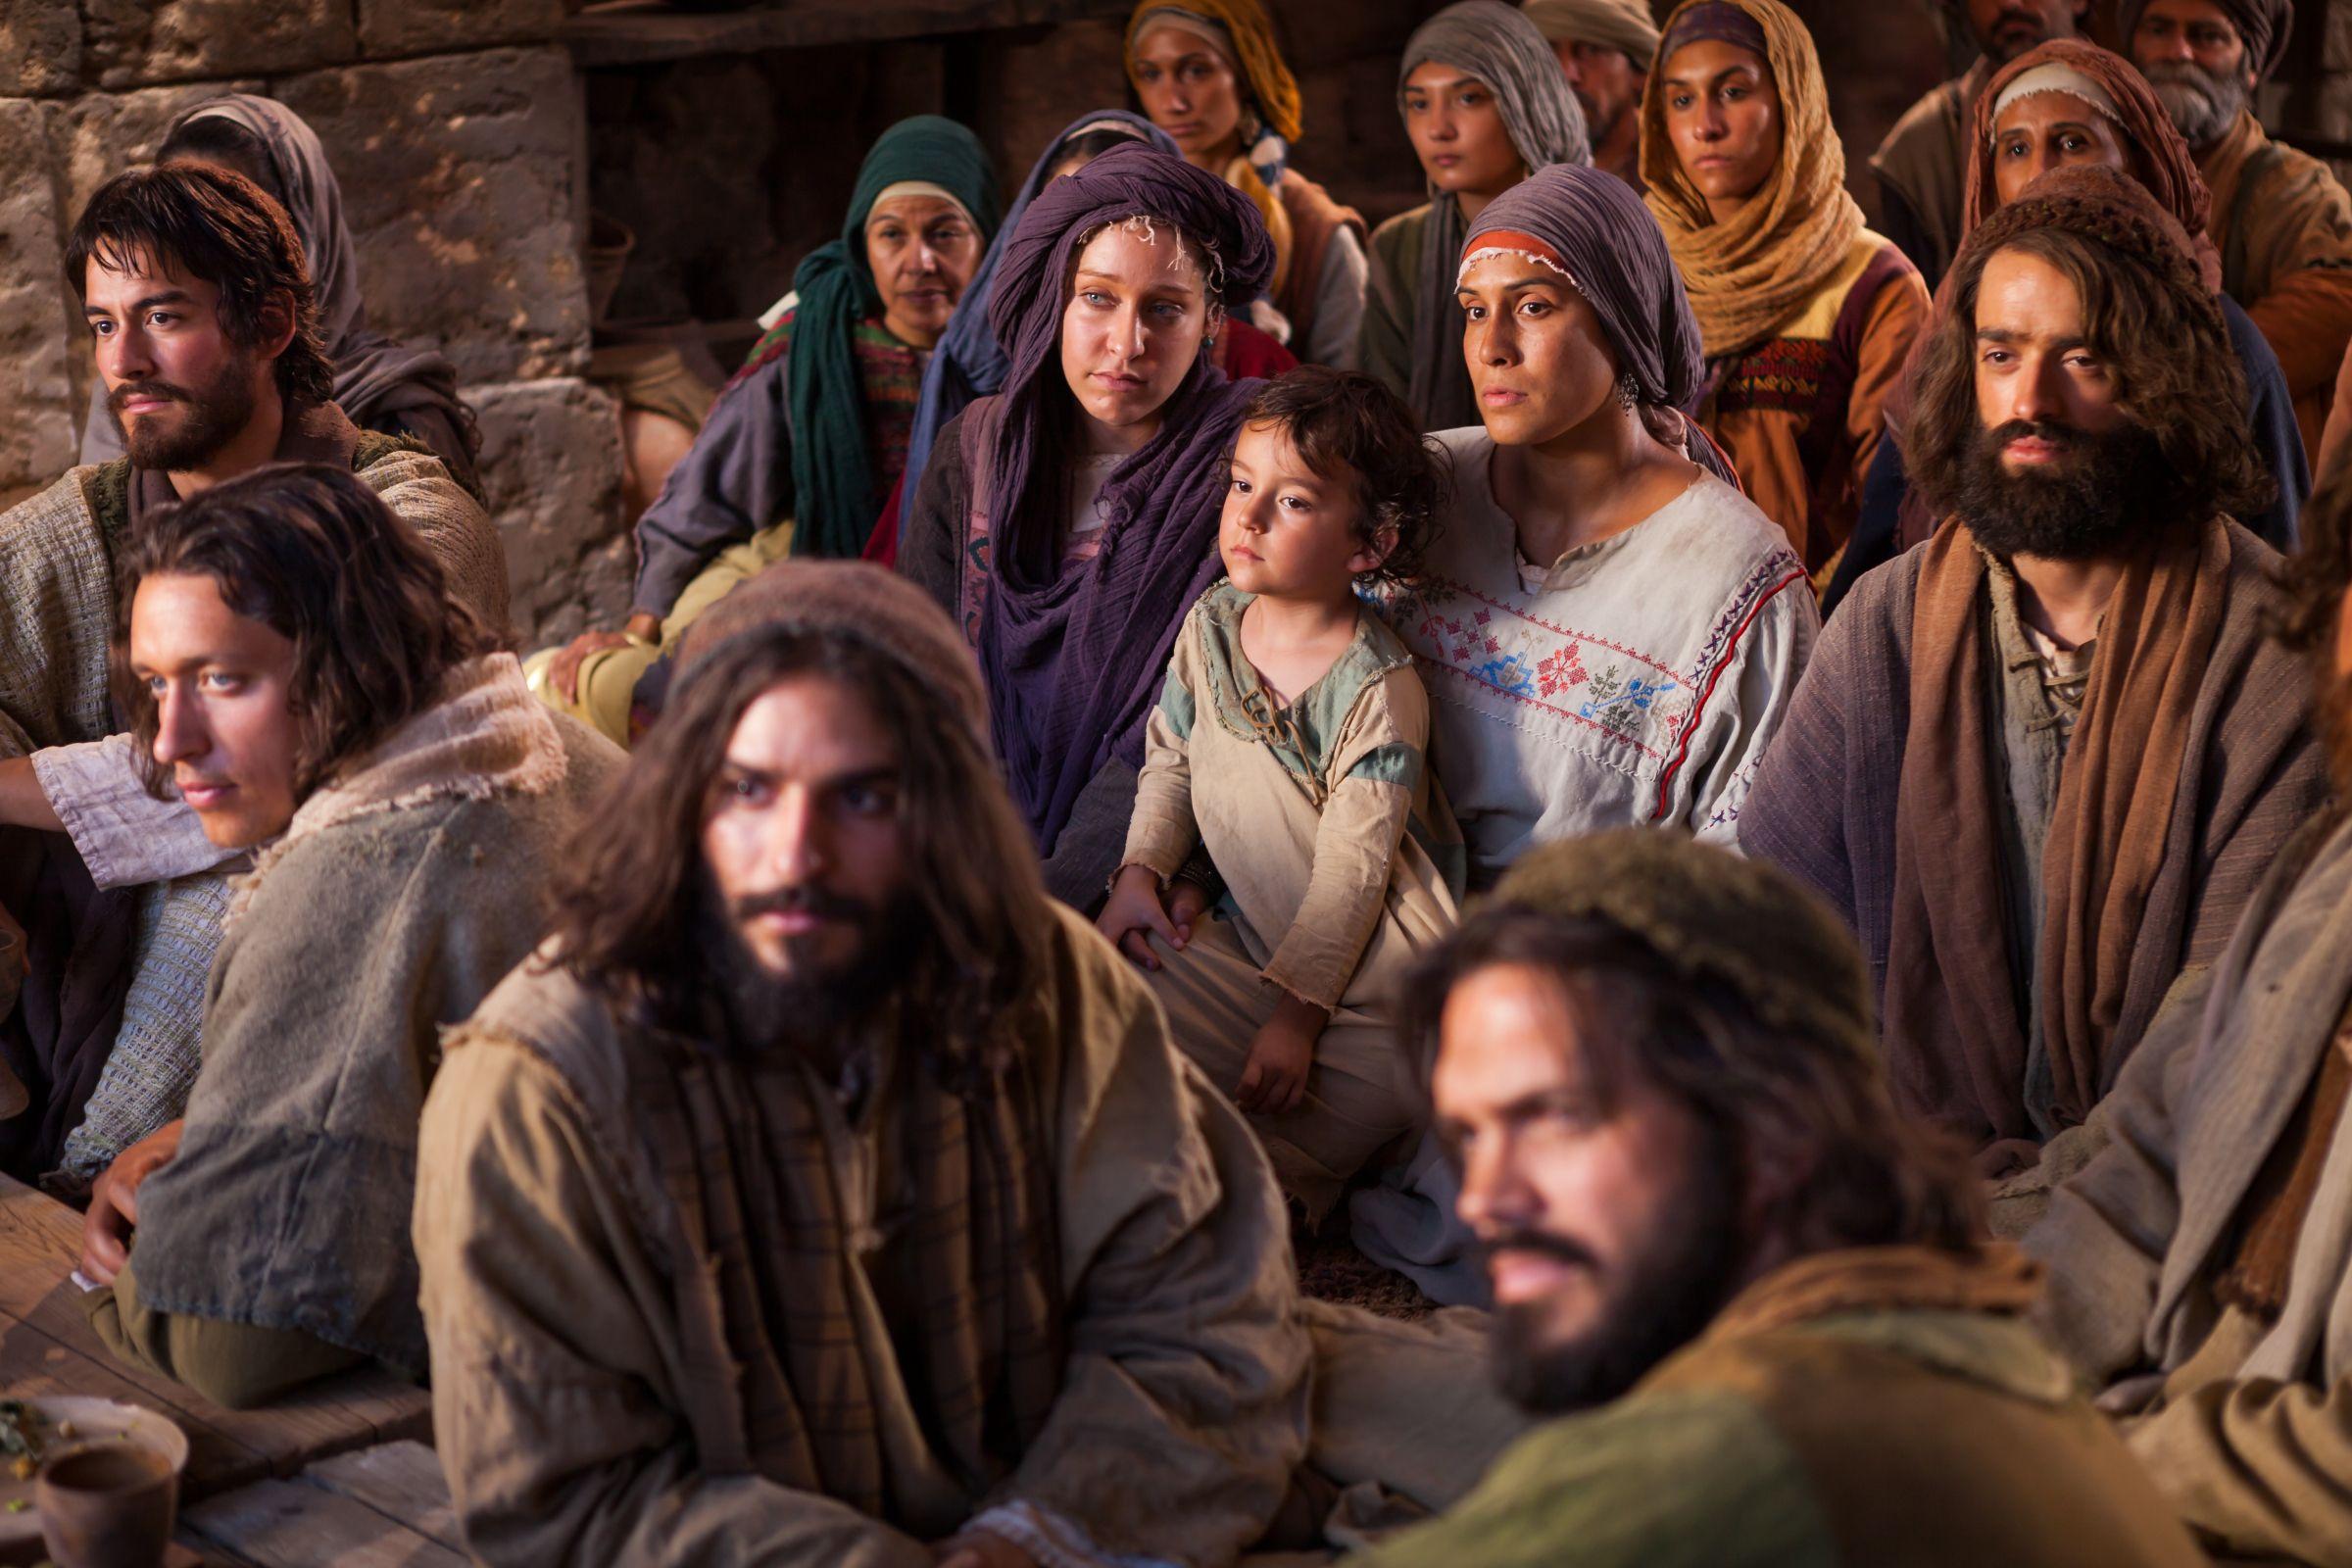 Bible Quote Wallpaper Apk Disciples Wallpaper Hd Wallpapers Images